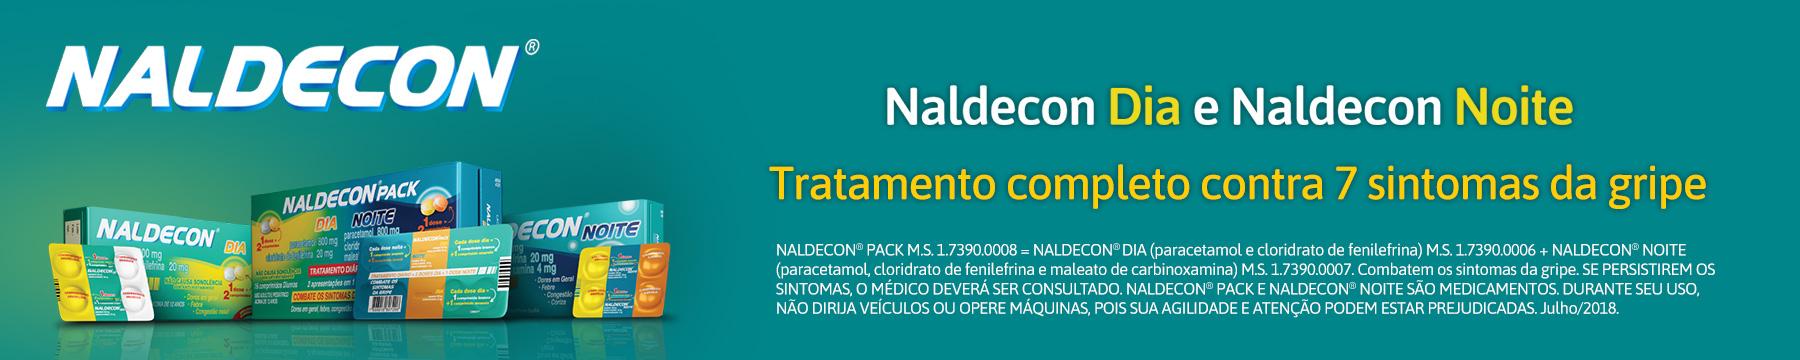 67f2cf6a197b911d784cd81c62d8618e1d9e2b20naldecon 1 1800 360 consulta remedios